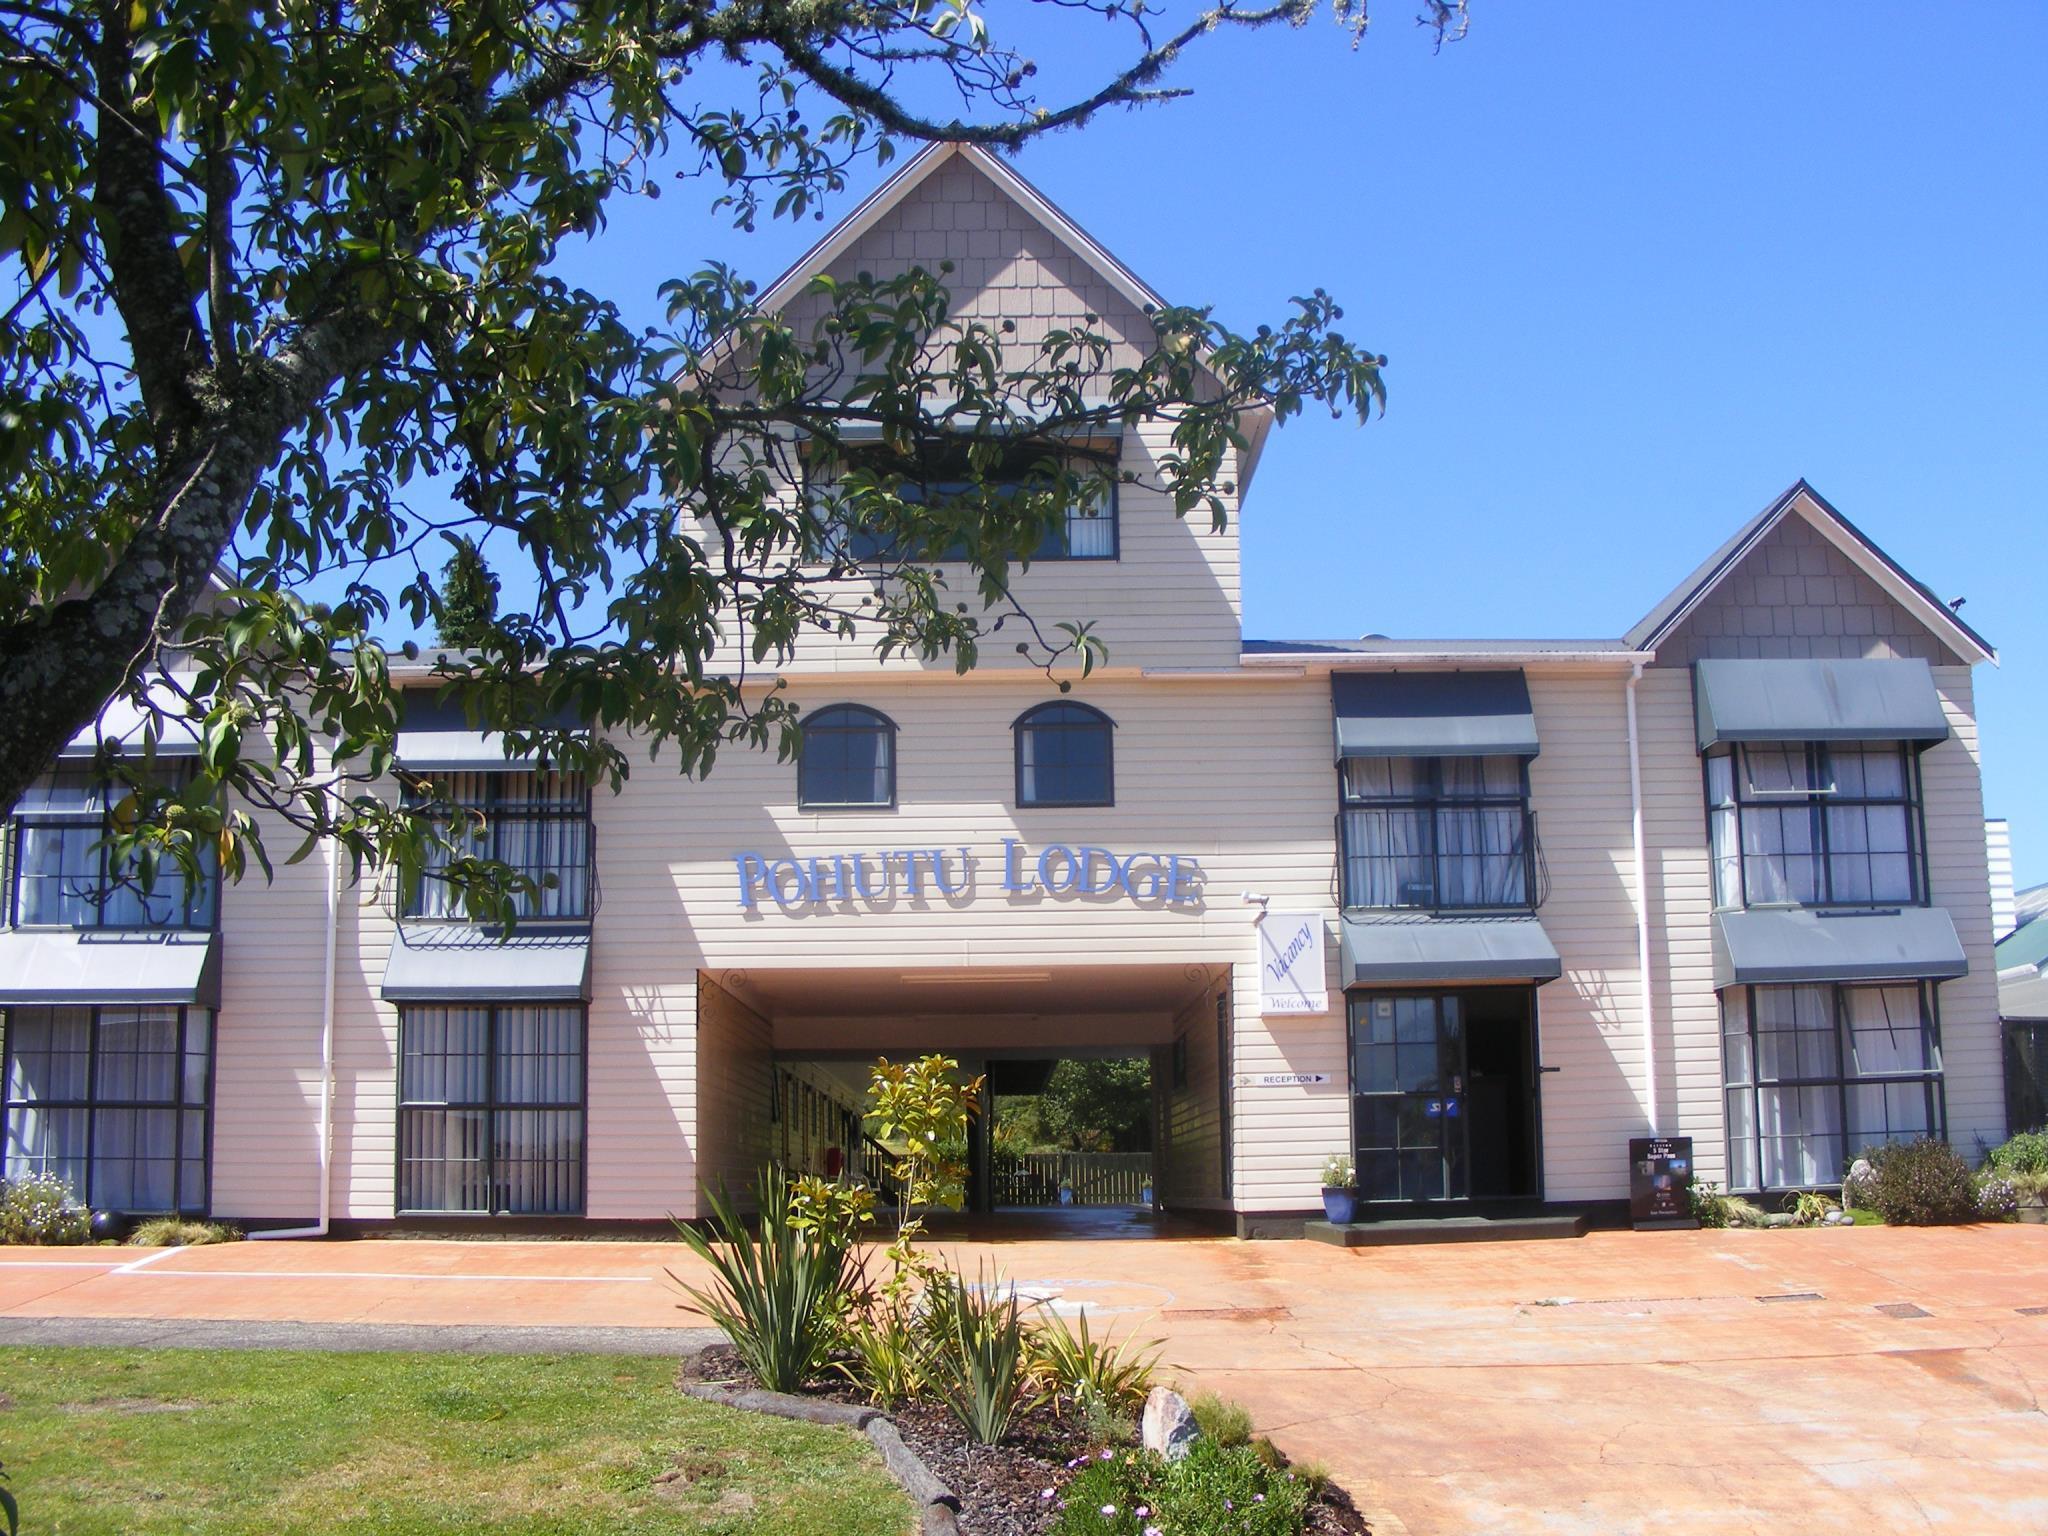 Pohutu Lodge Hotel